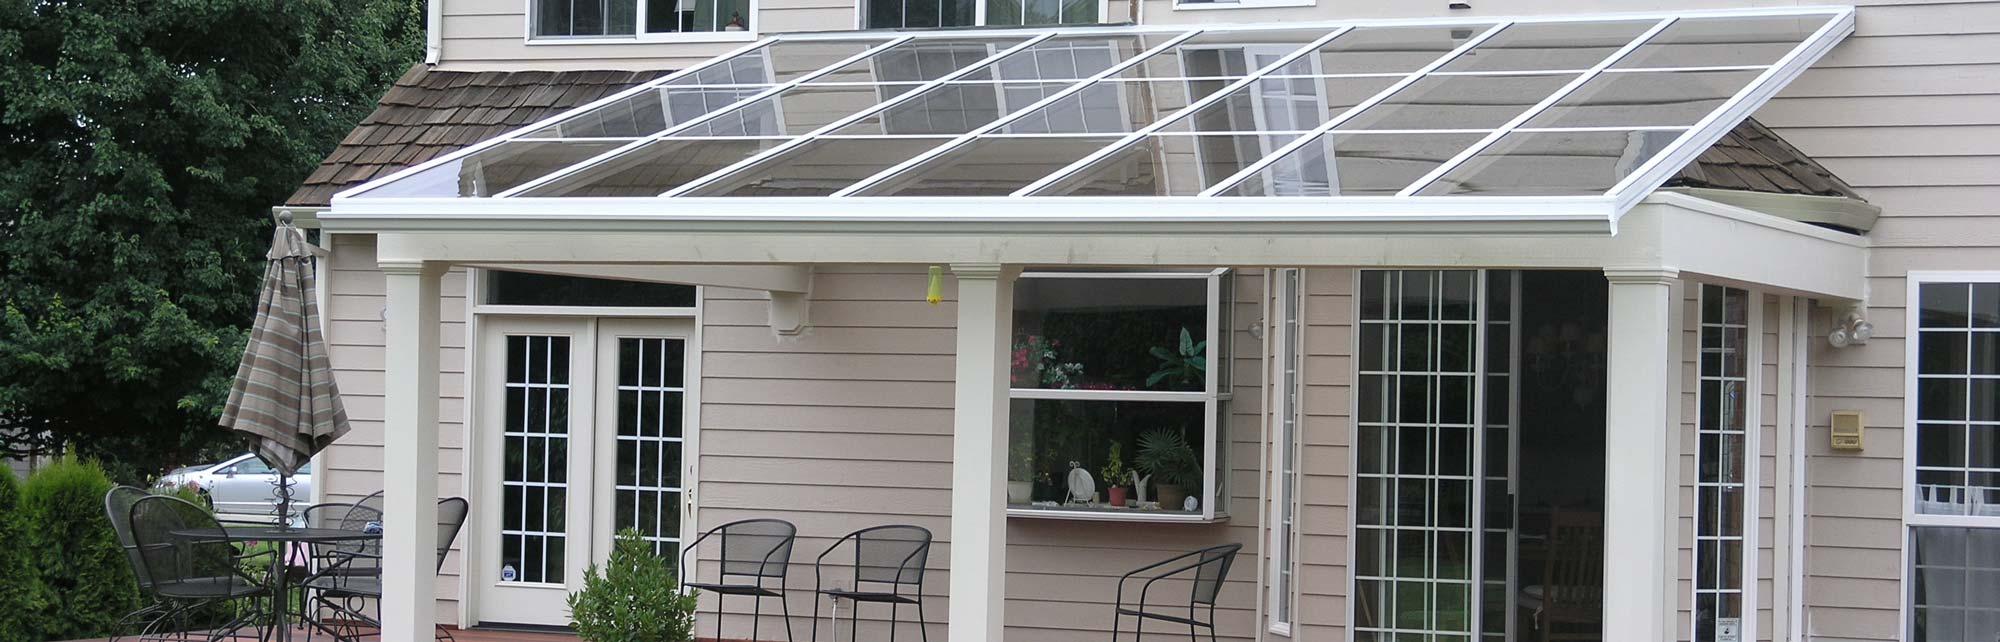 patio cover for a backyard patio